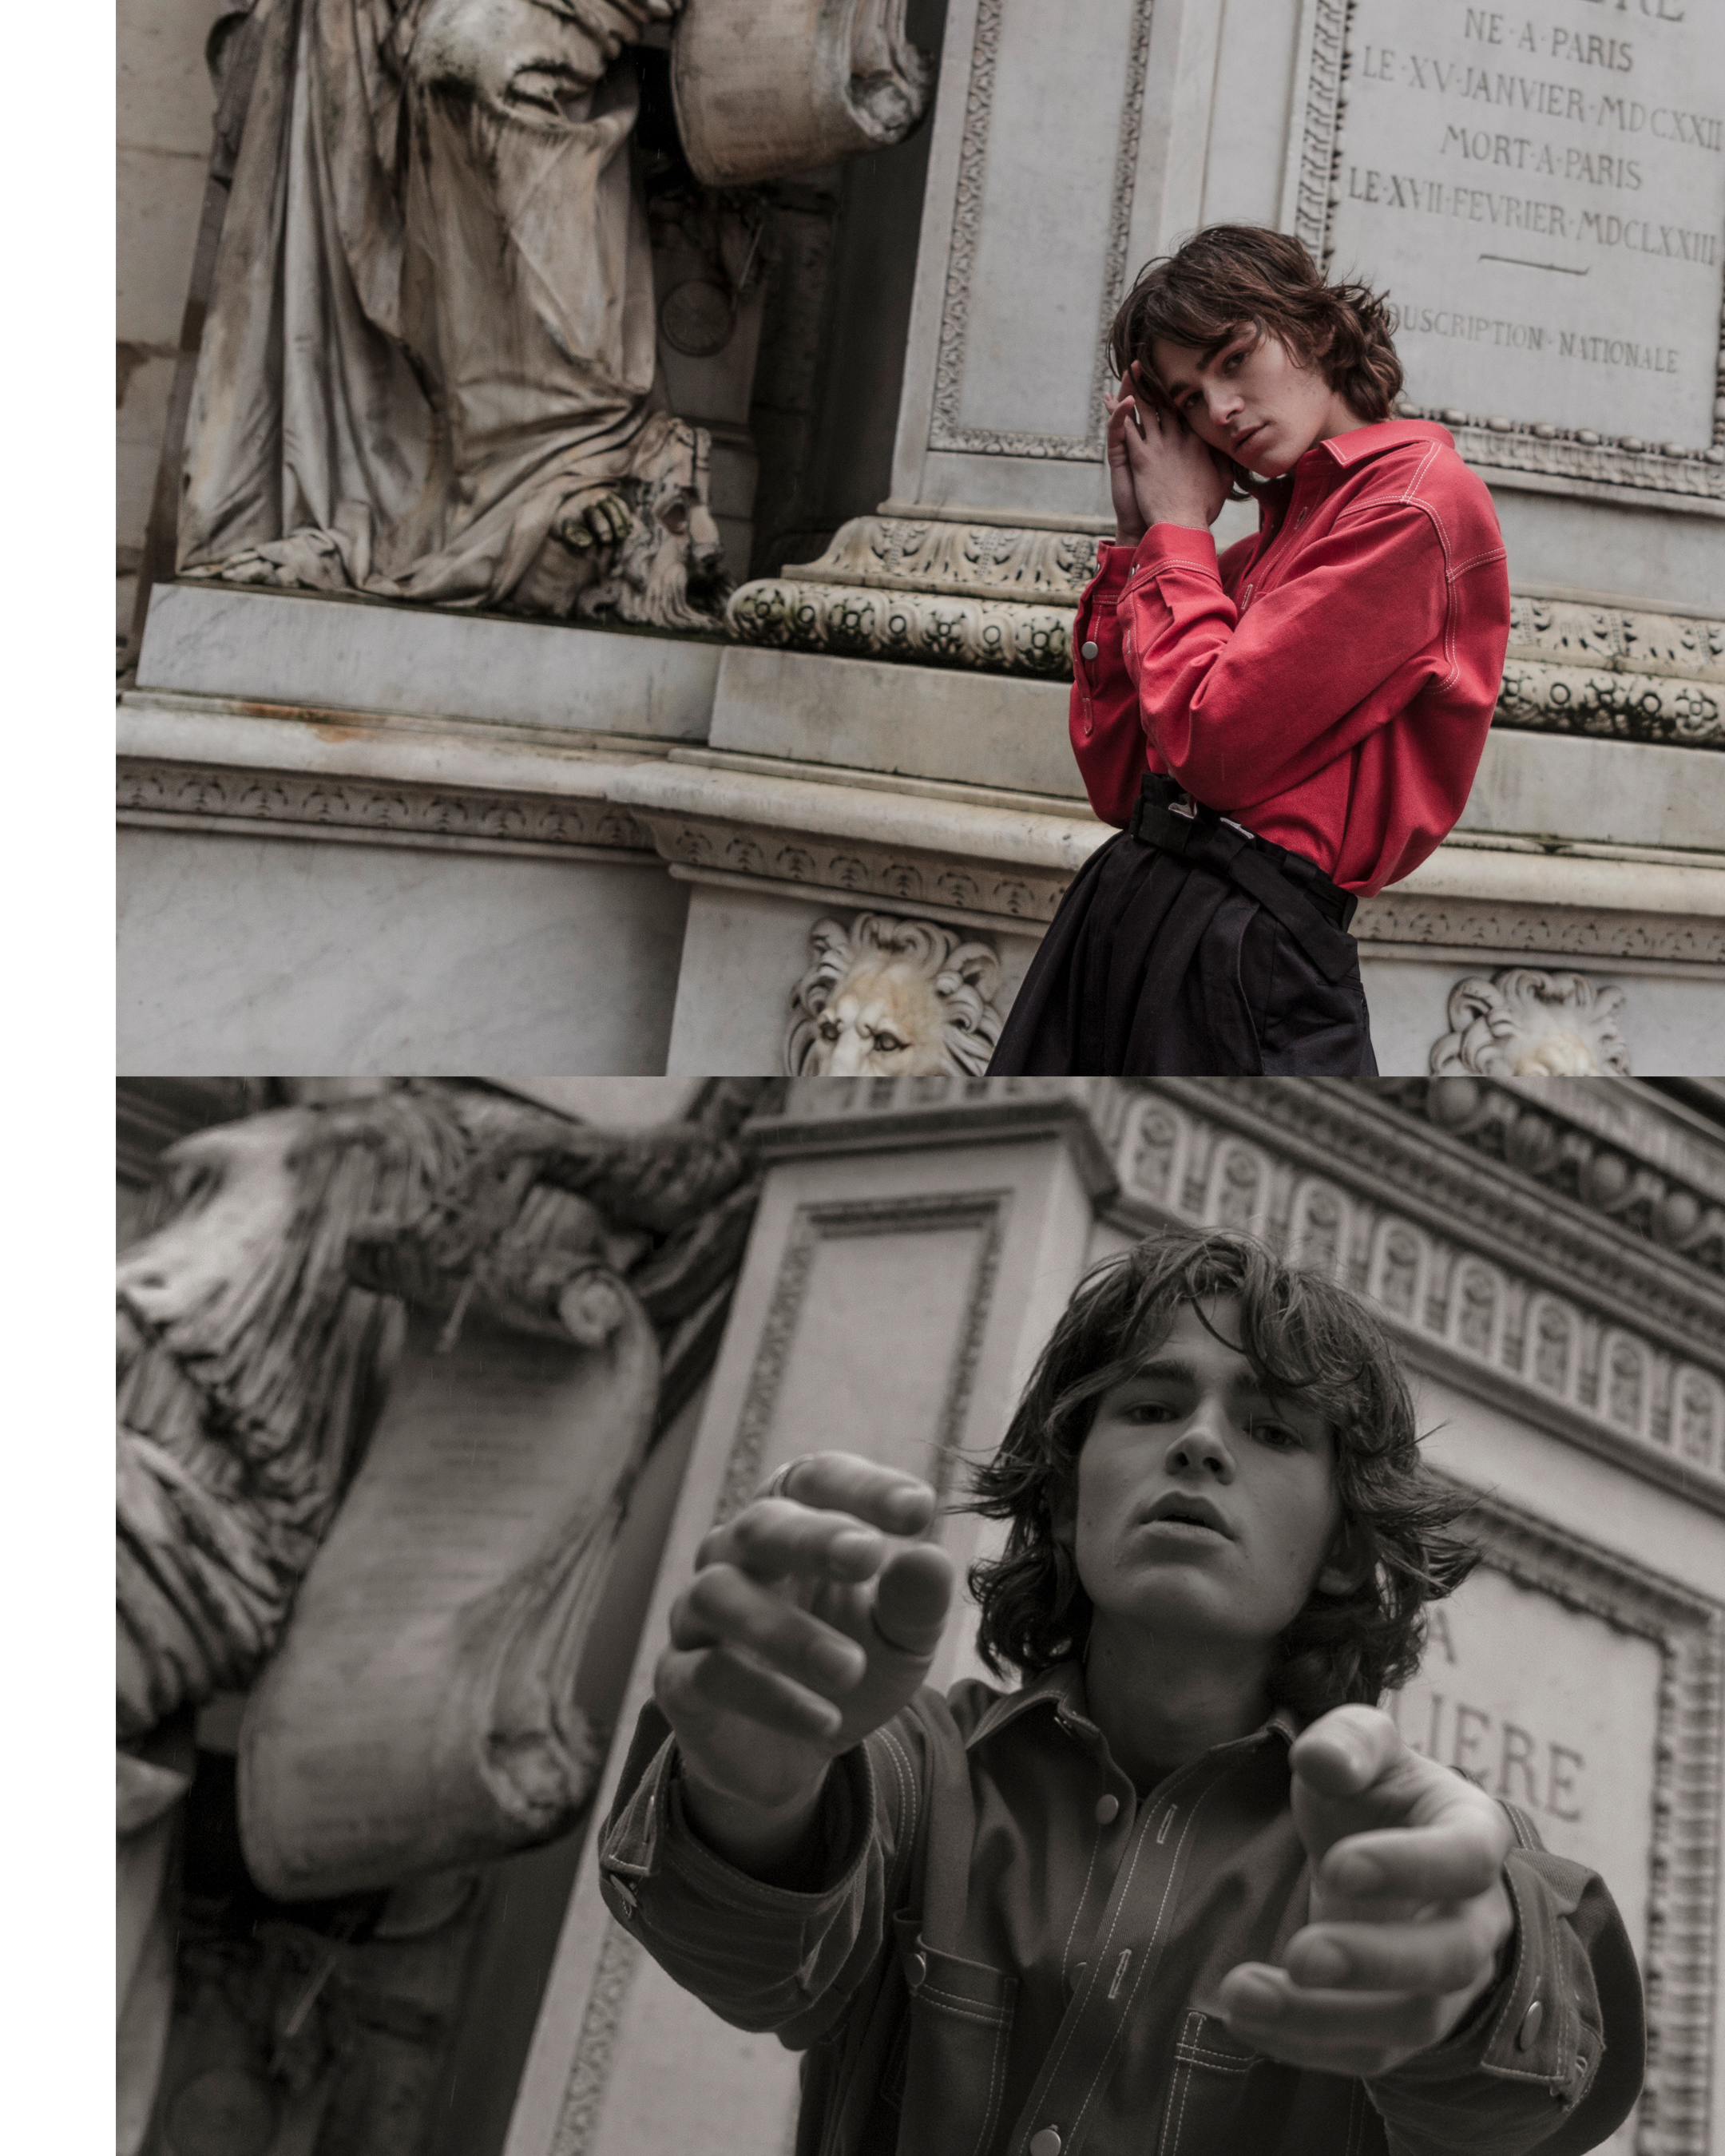 OWOI_MensFashionPost_SimonSchmidt_Paris_2018_Slide3_04.jpg